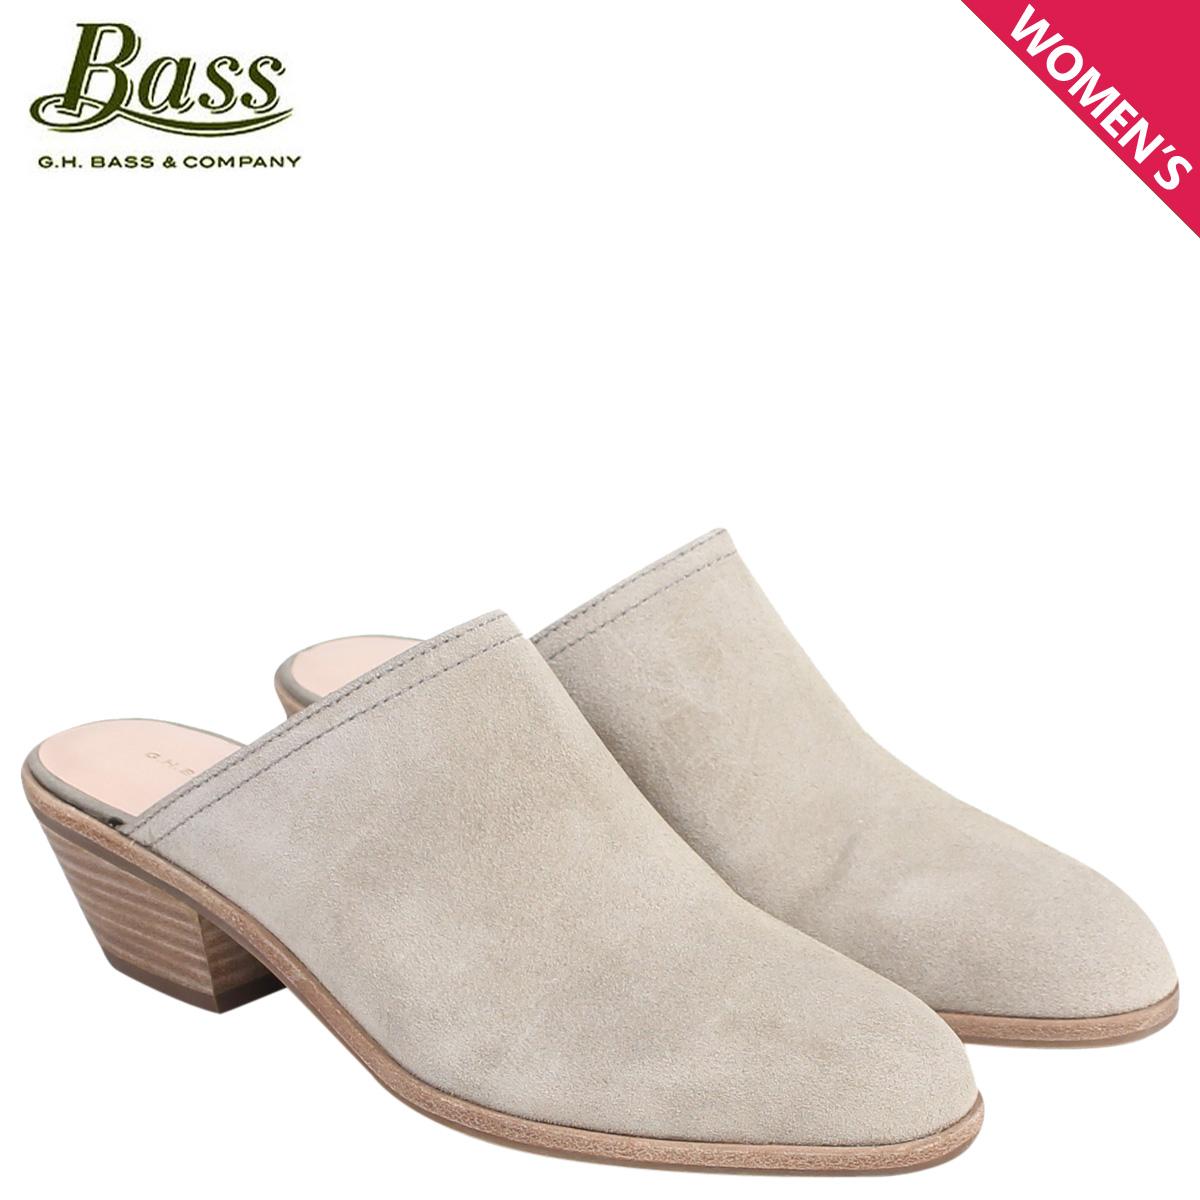 G H bus sandals Lady's G.H. BASS mule sabot clog NIKKI MULE 71-23,505 shoes  gray [177]